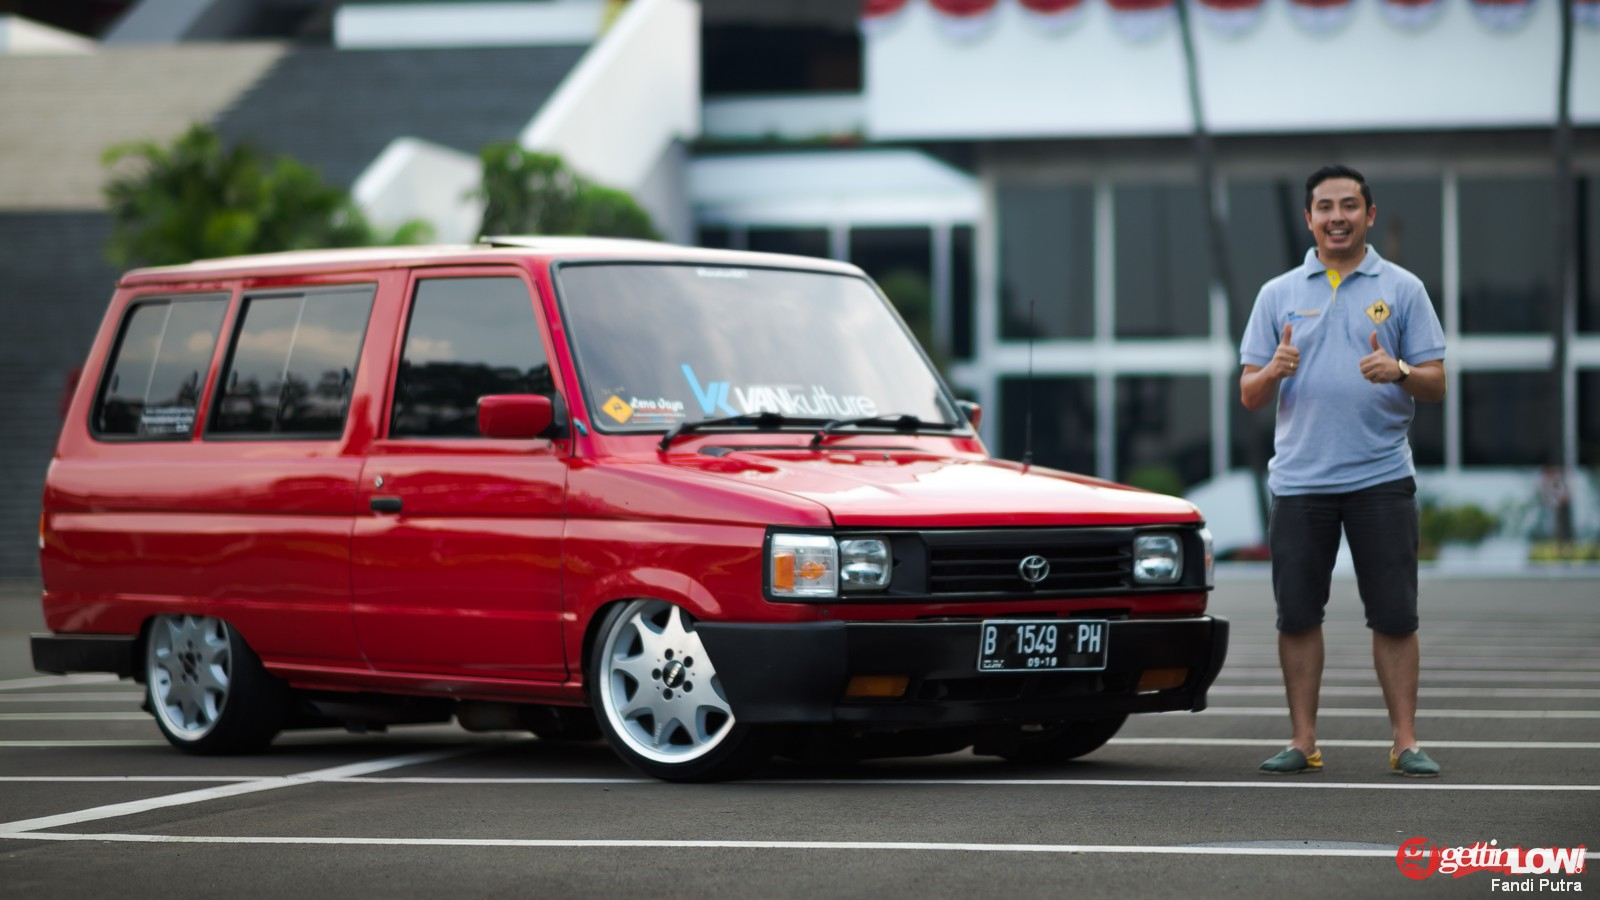 Mobil Kijang Kapsul Sx 97 - Penghemat BBM Paling Ampuh ...